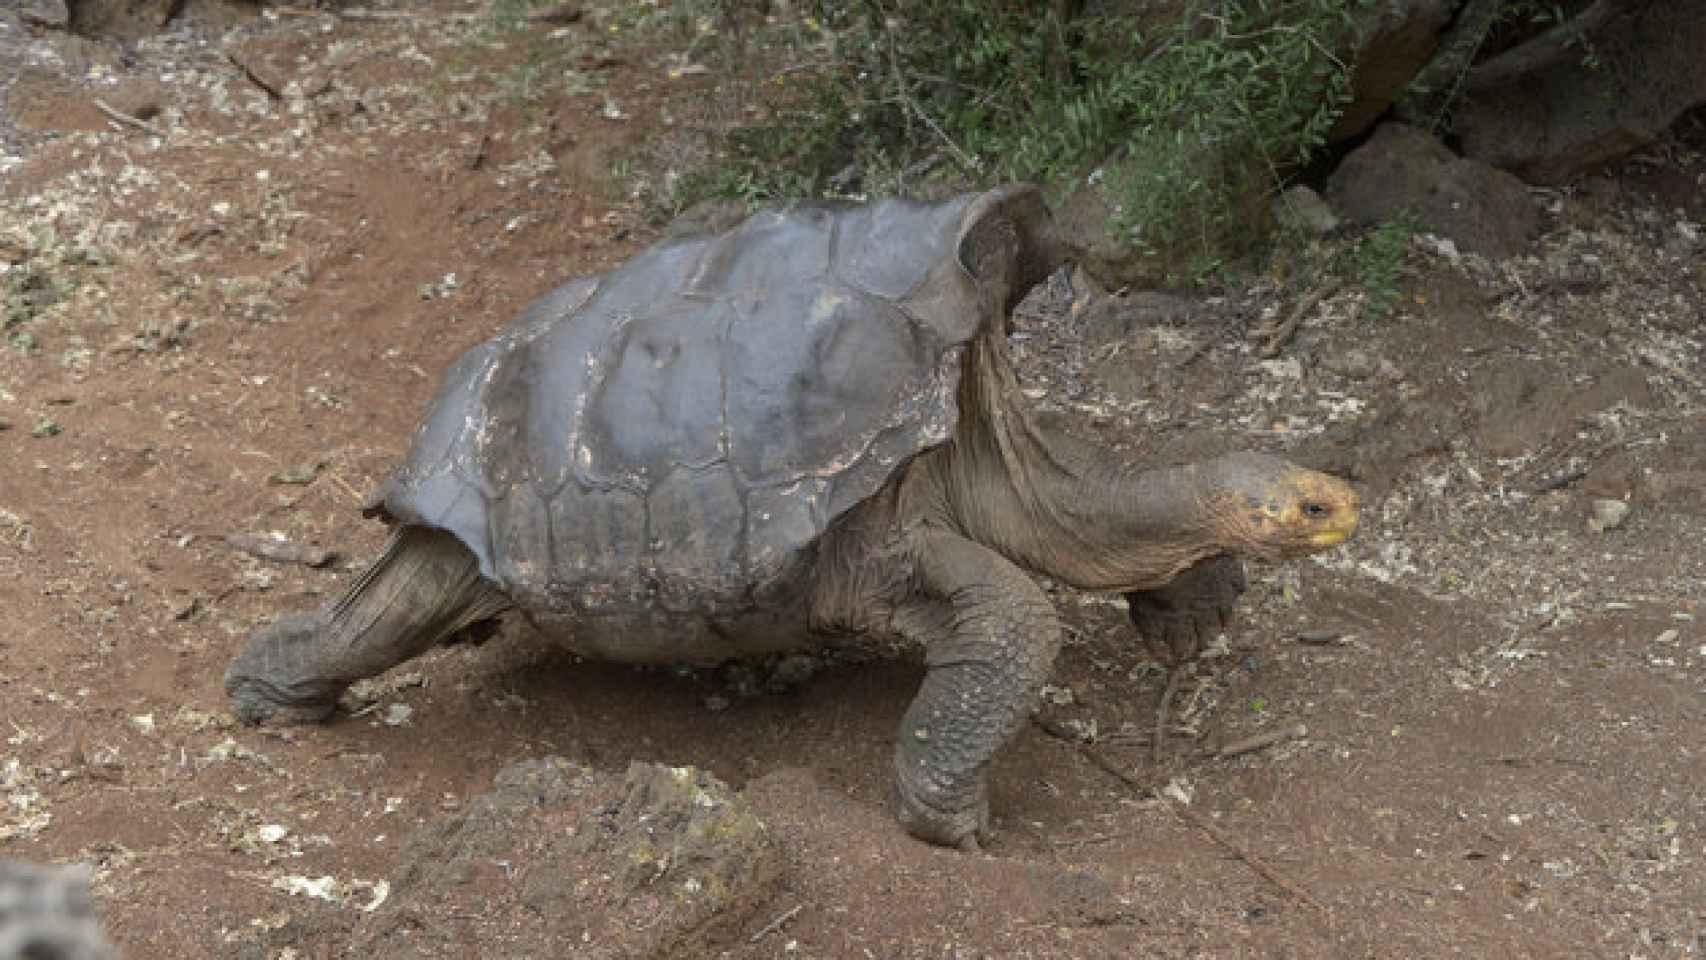 La tortuga Diego